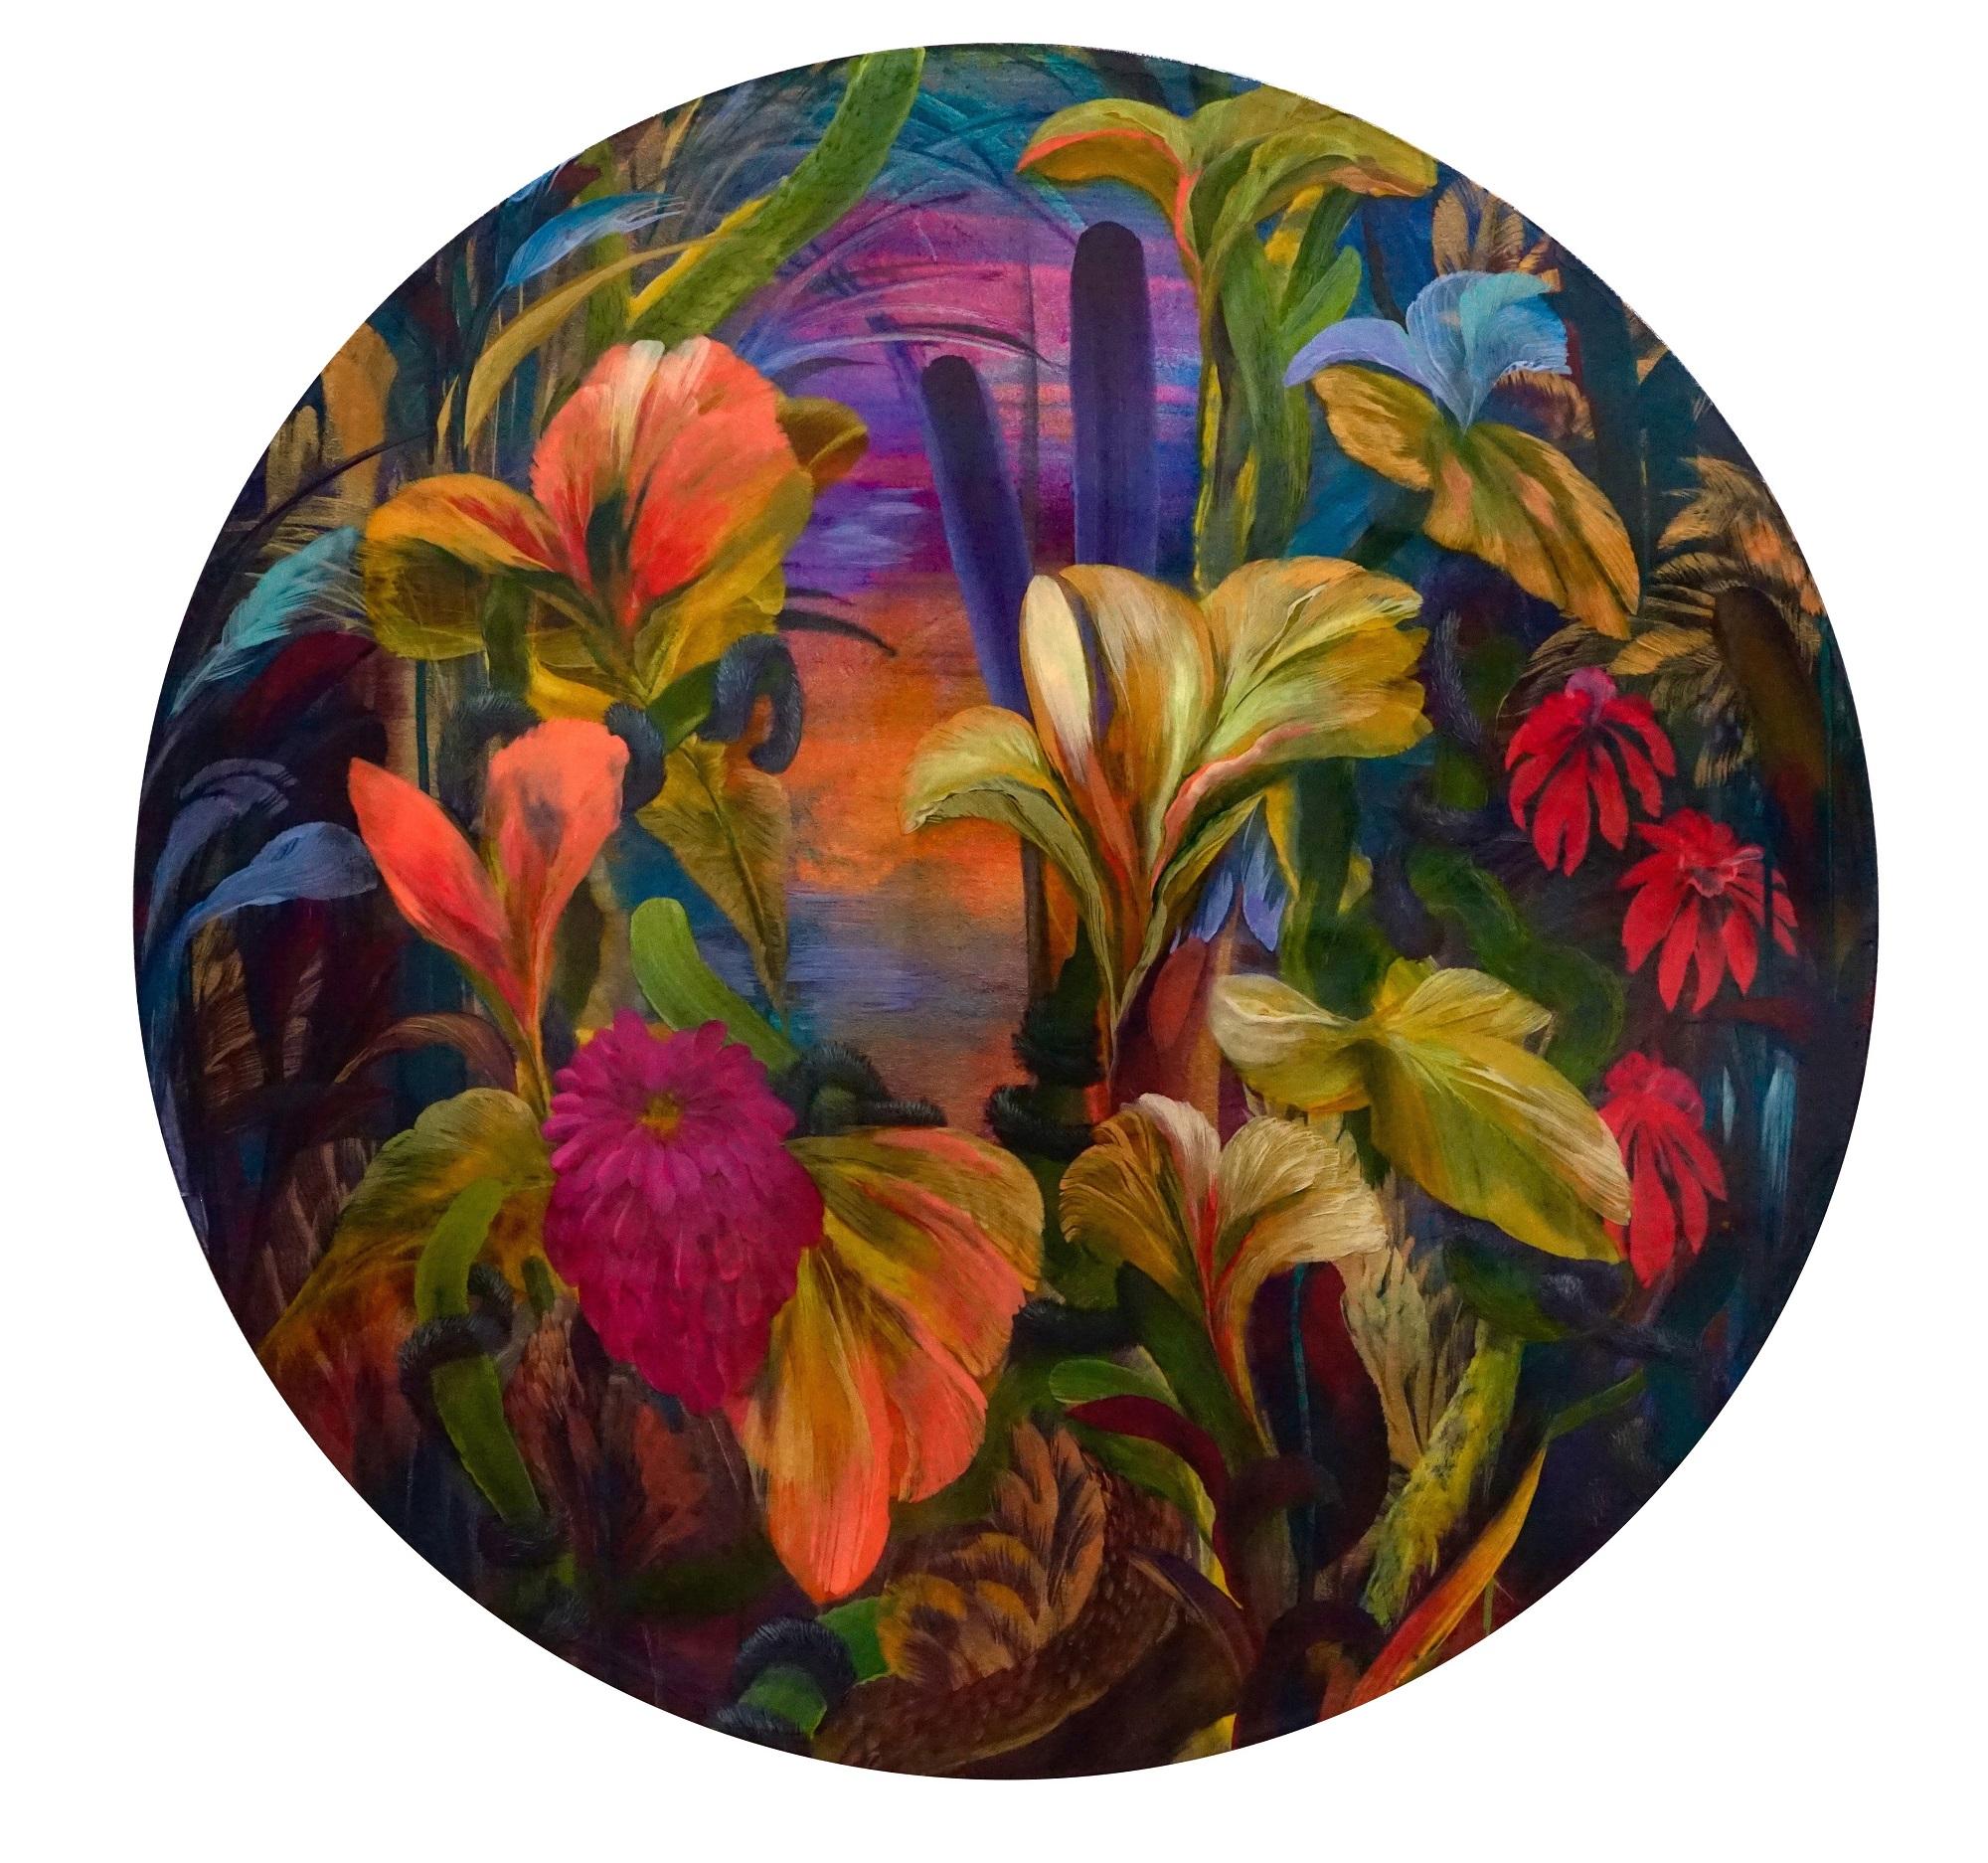 'Kudzo' Orlanda Broom Acrylic and resin on canvas, 100cm diameter, 2017